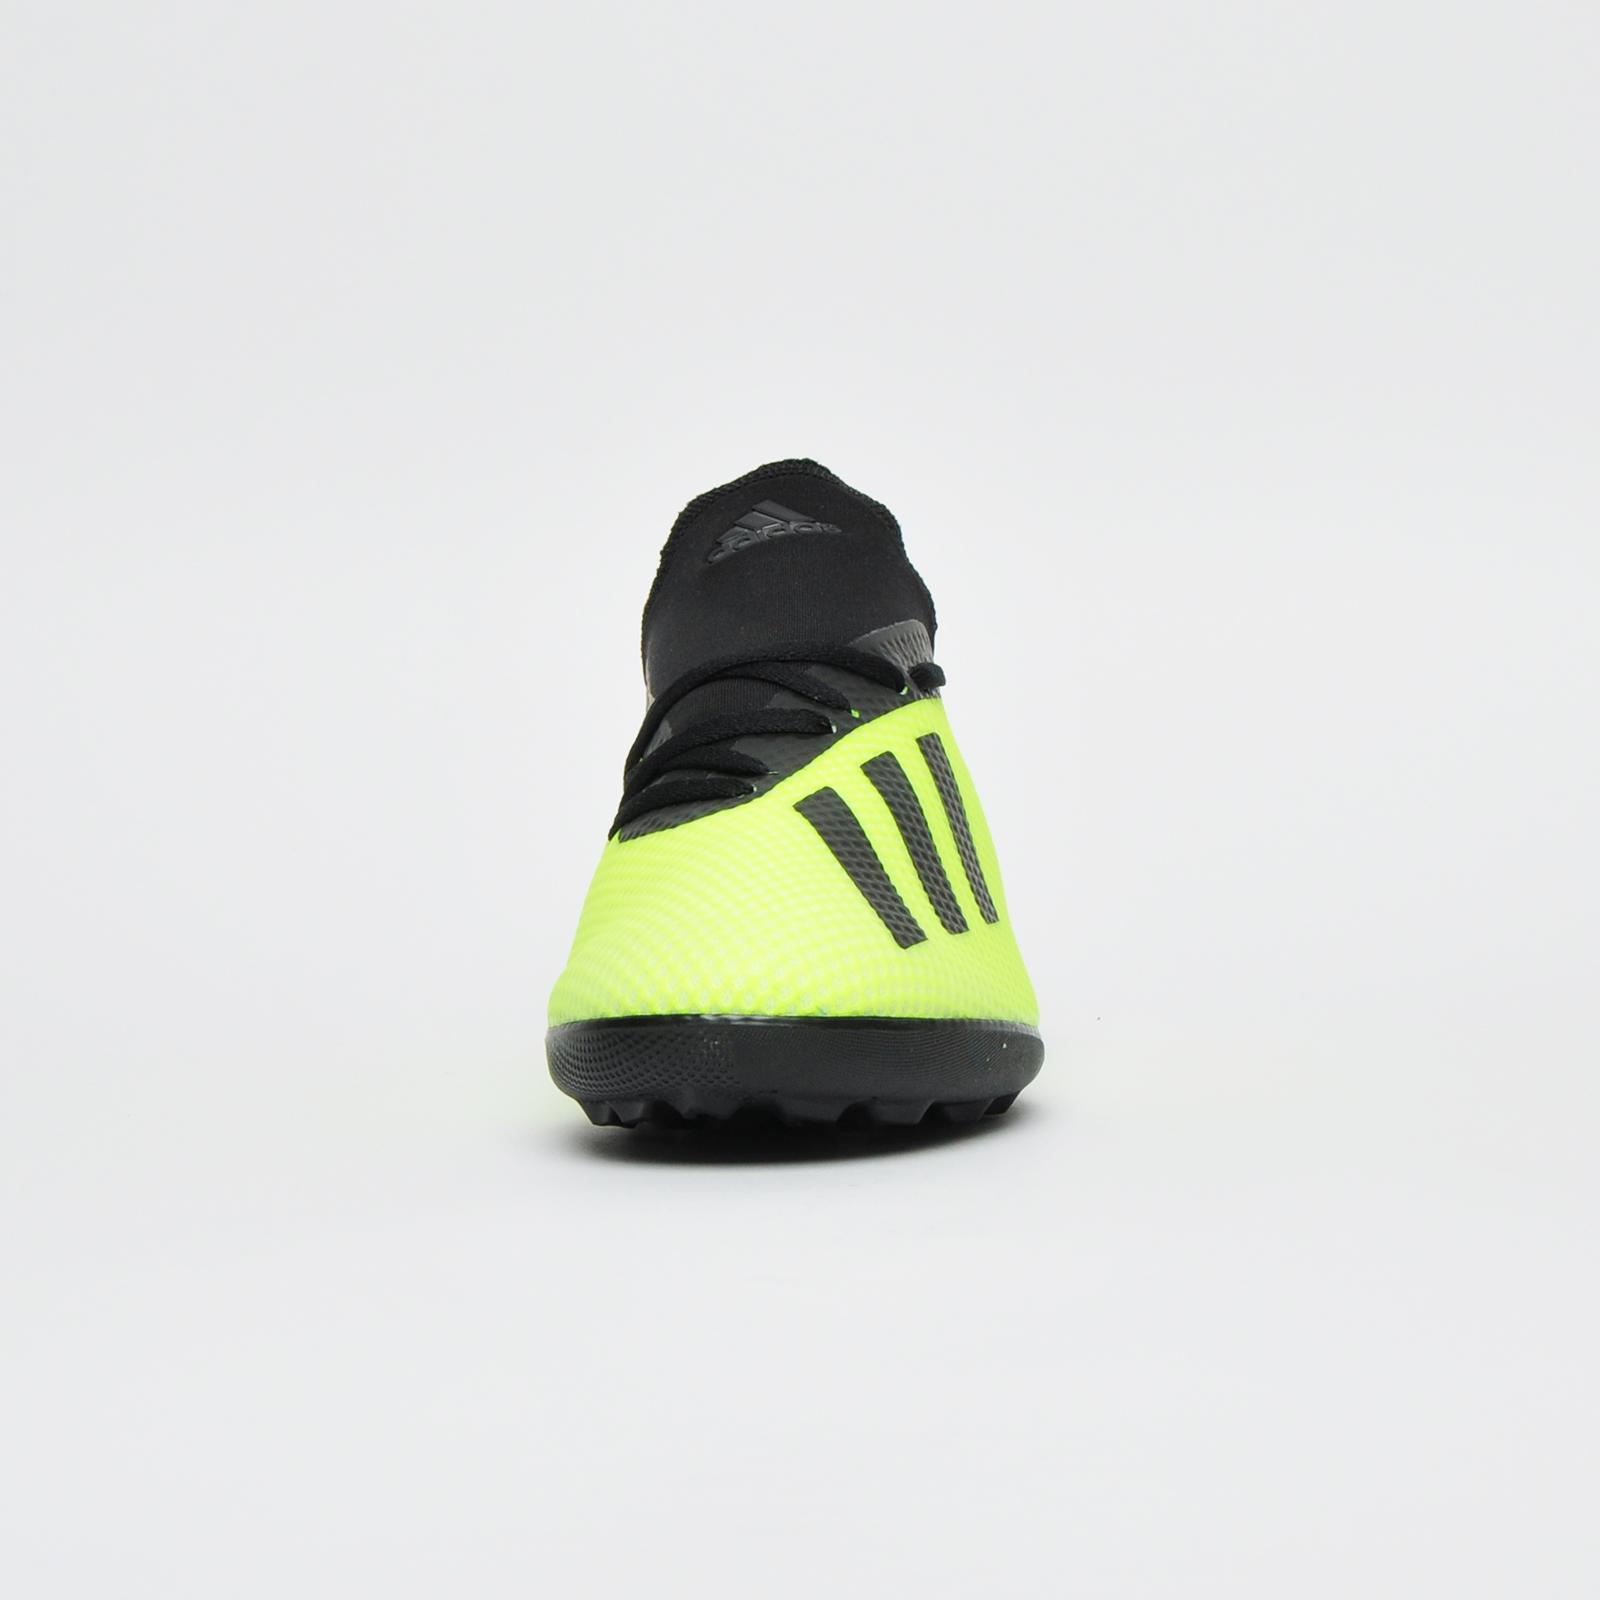 Détails sur Adidas X Tango 18.3 Tf Homme Pro Astro Turf Football Baskets